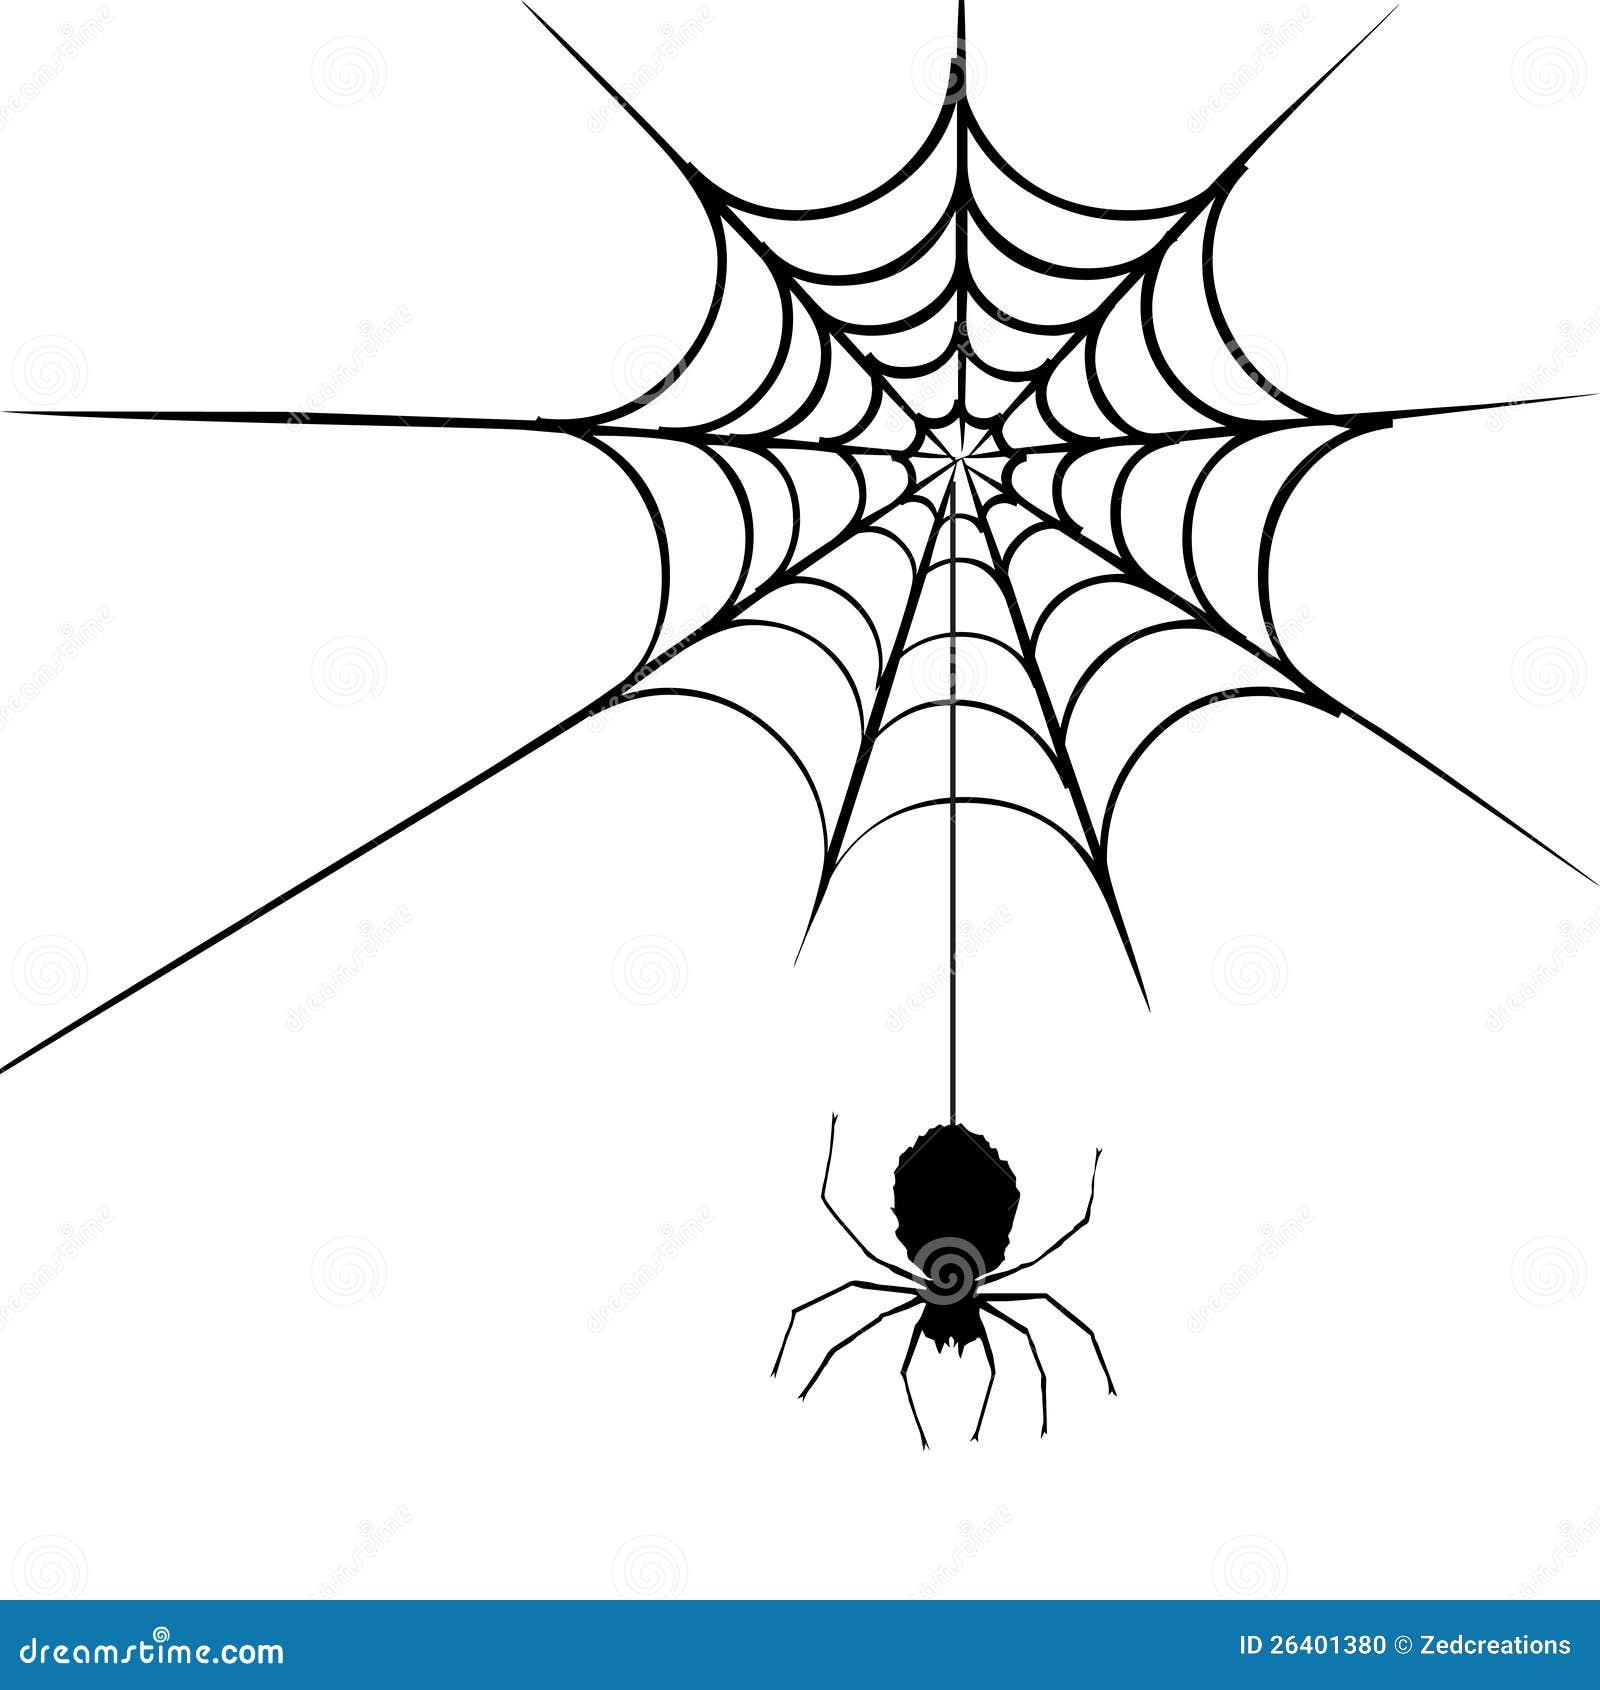 Corner spider web design - photo#28